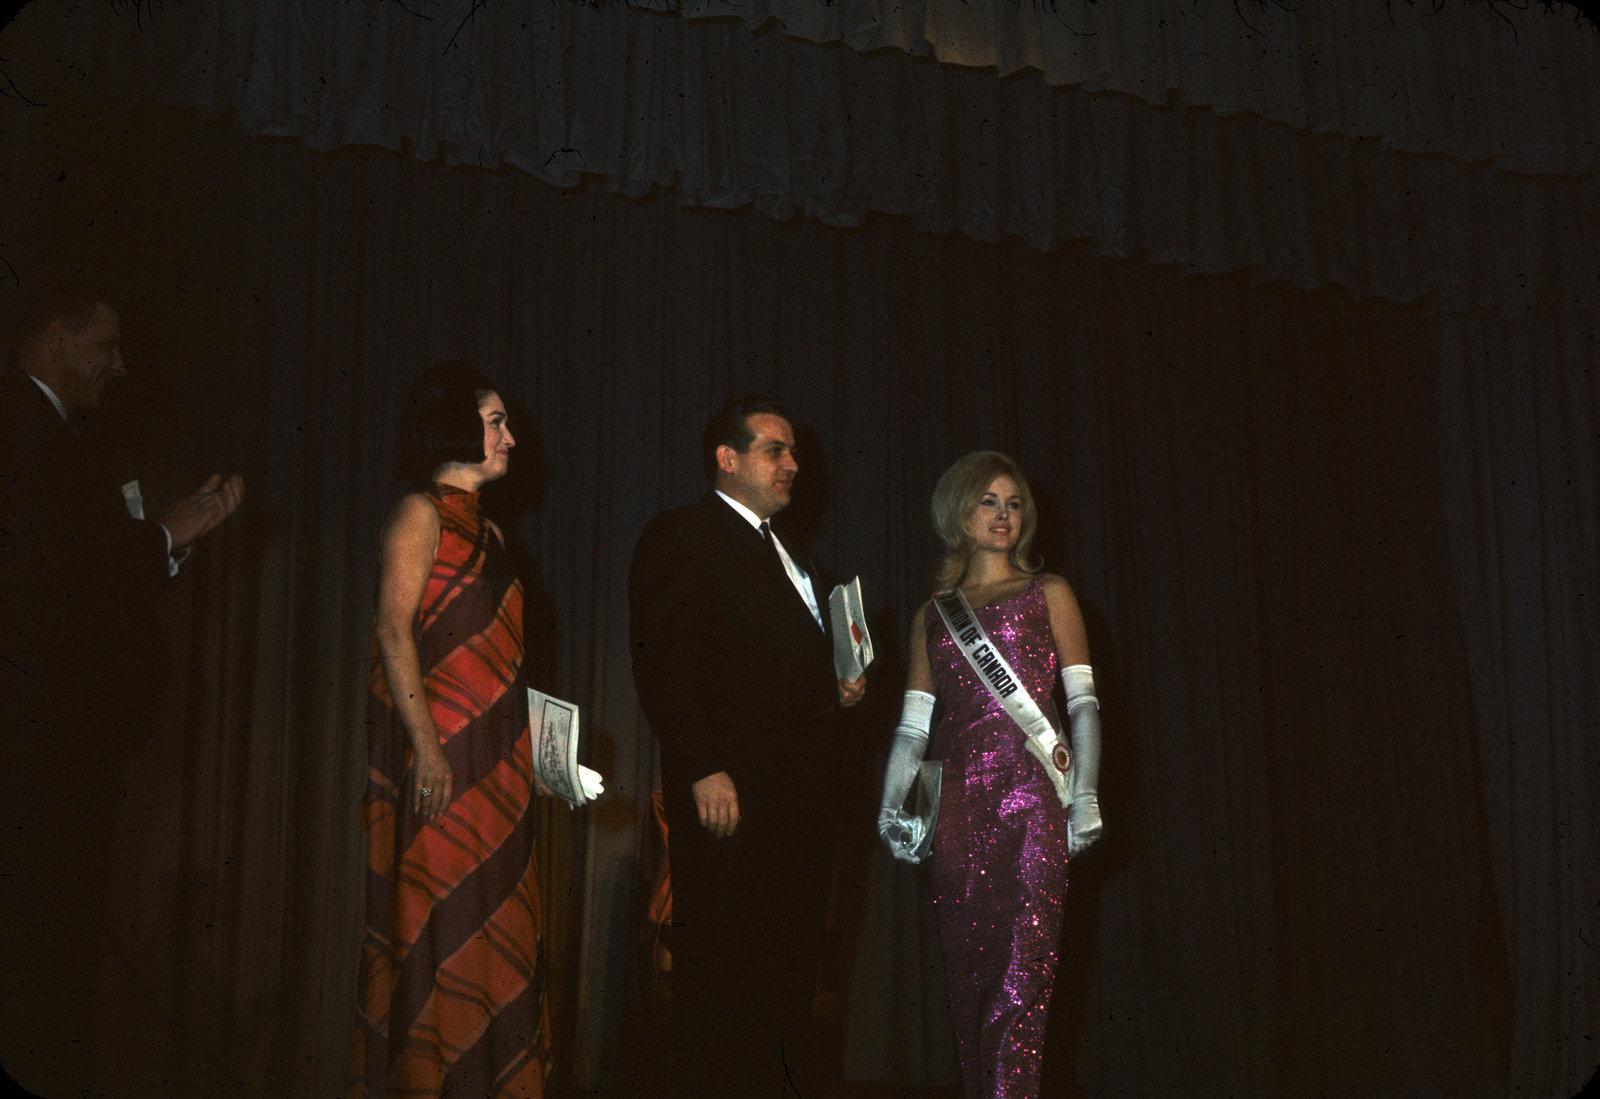 1967 Miss Canadian University Queen Pageant judges